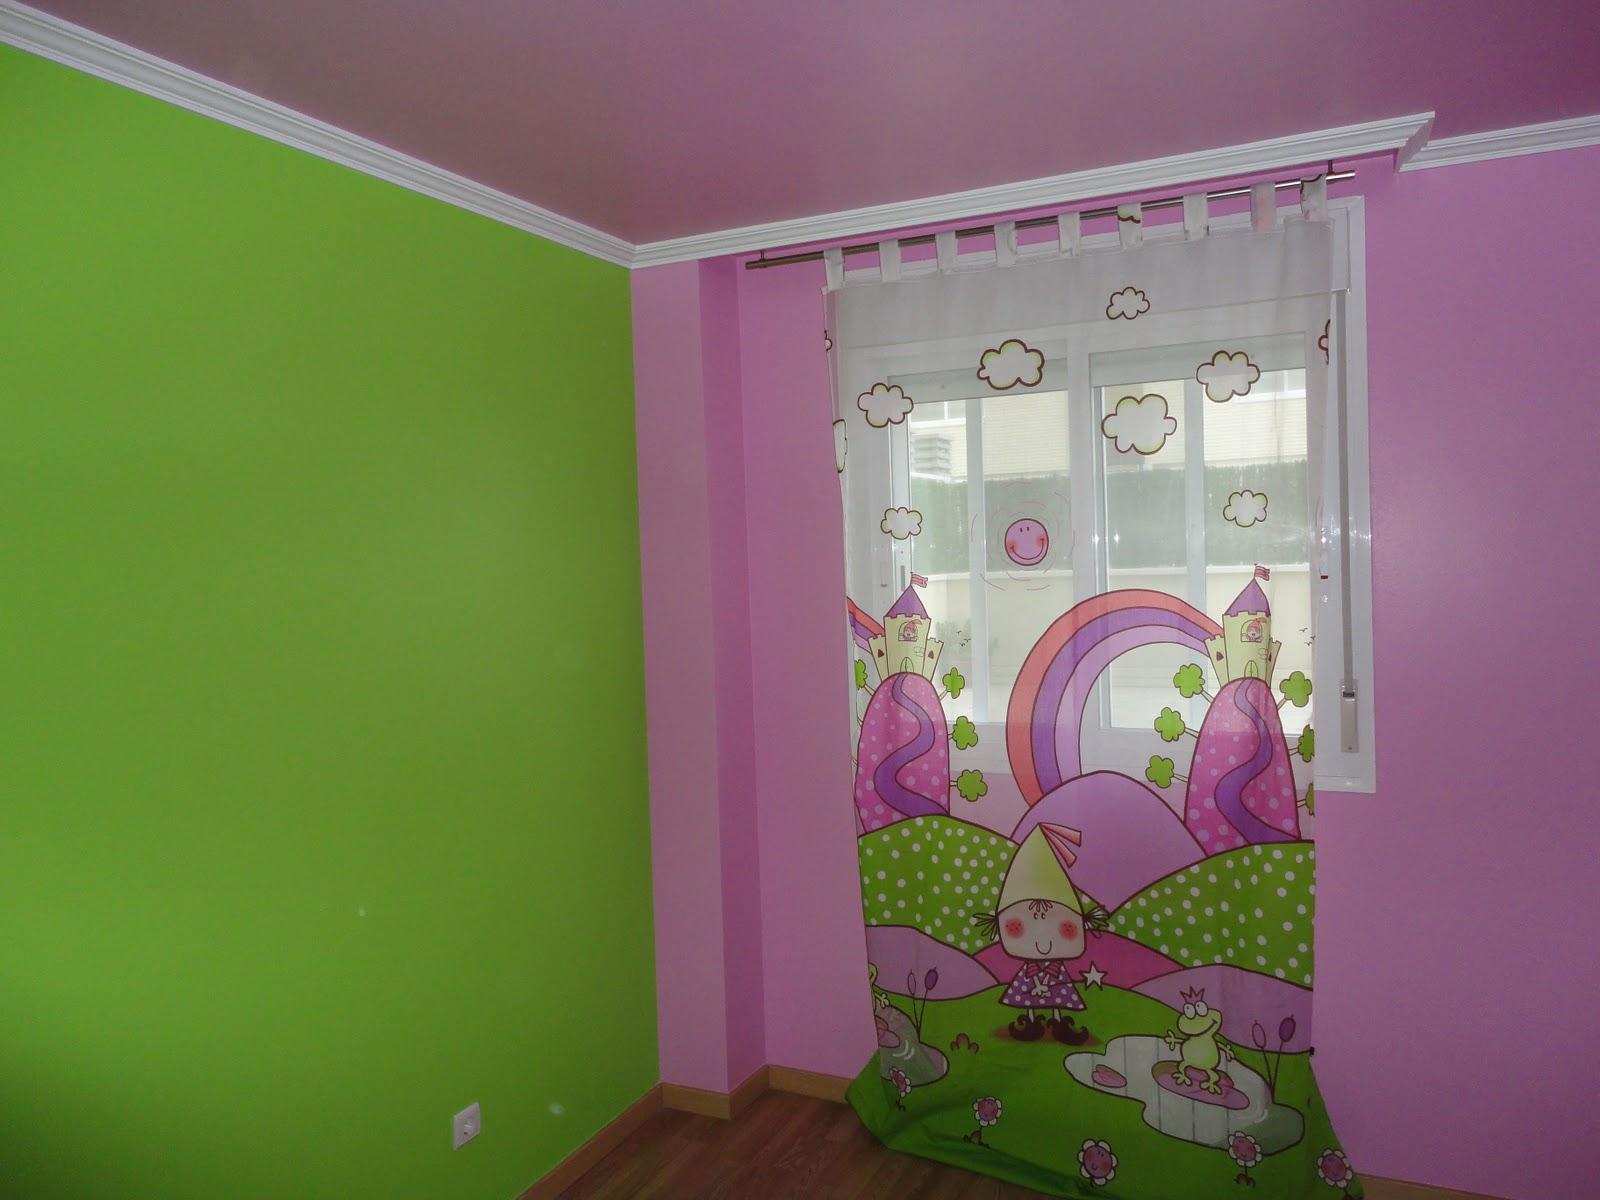 Habitaci n infantil pintor david martinez for Colores para habitacion infantil